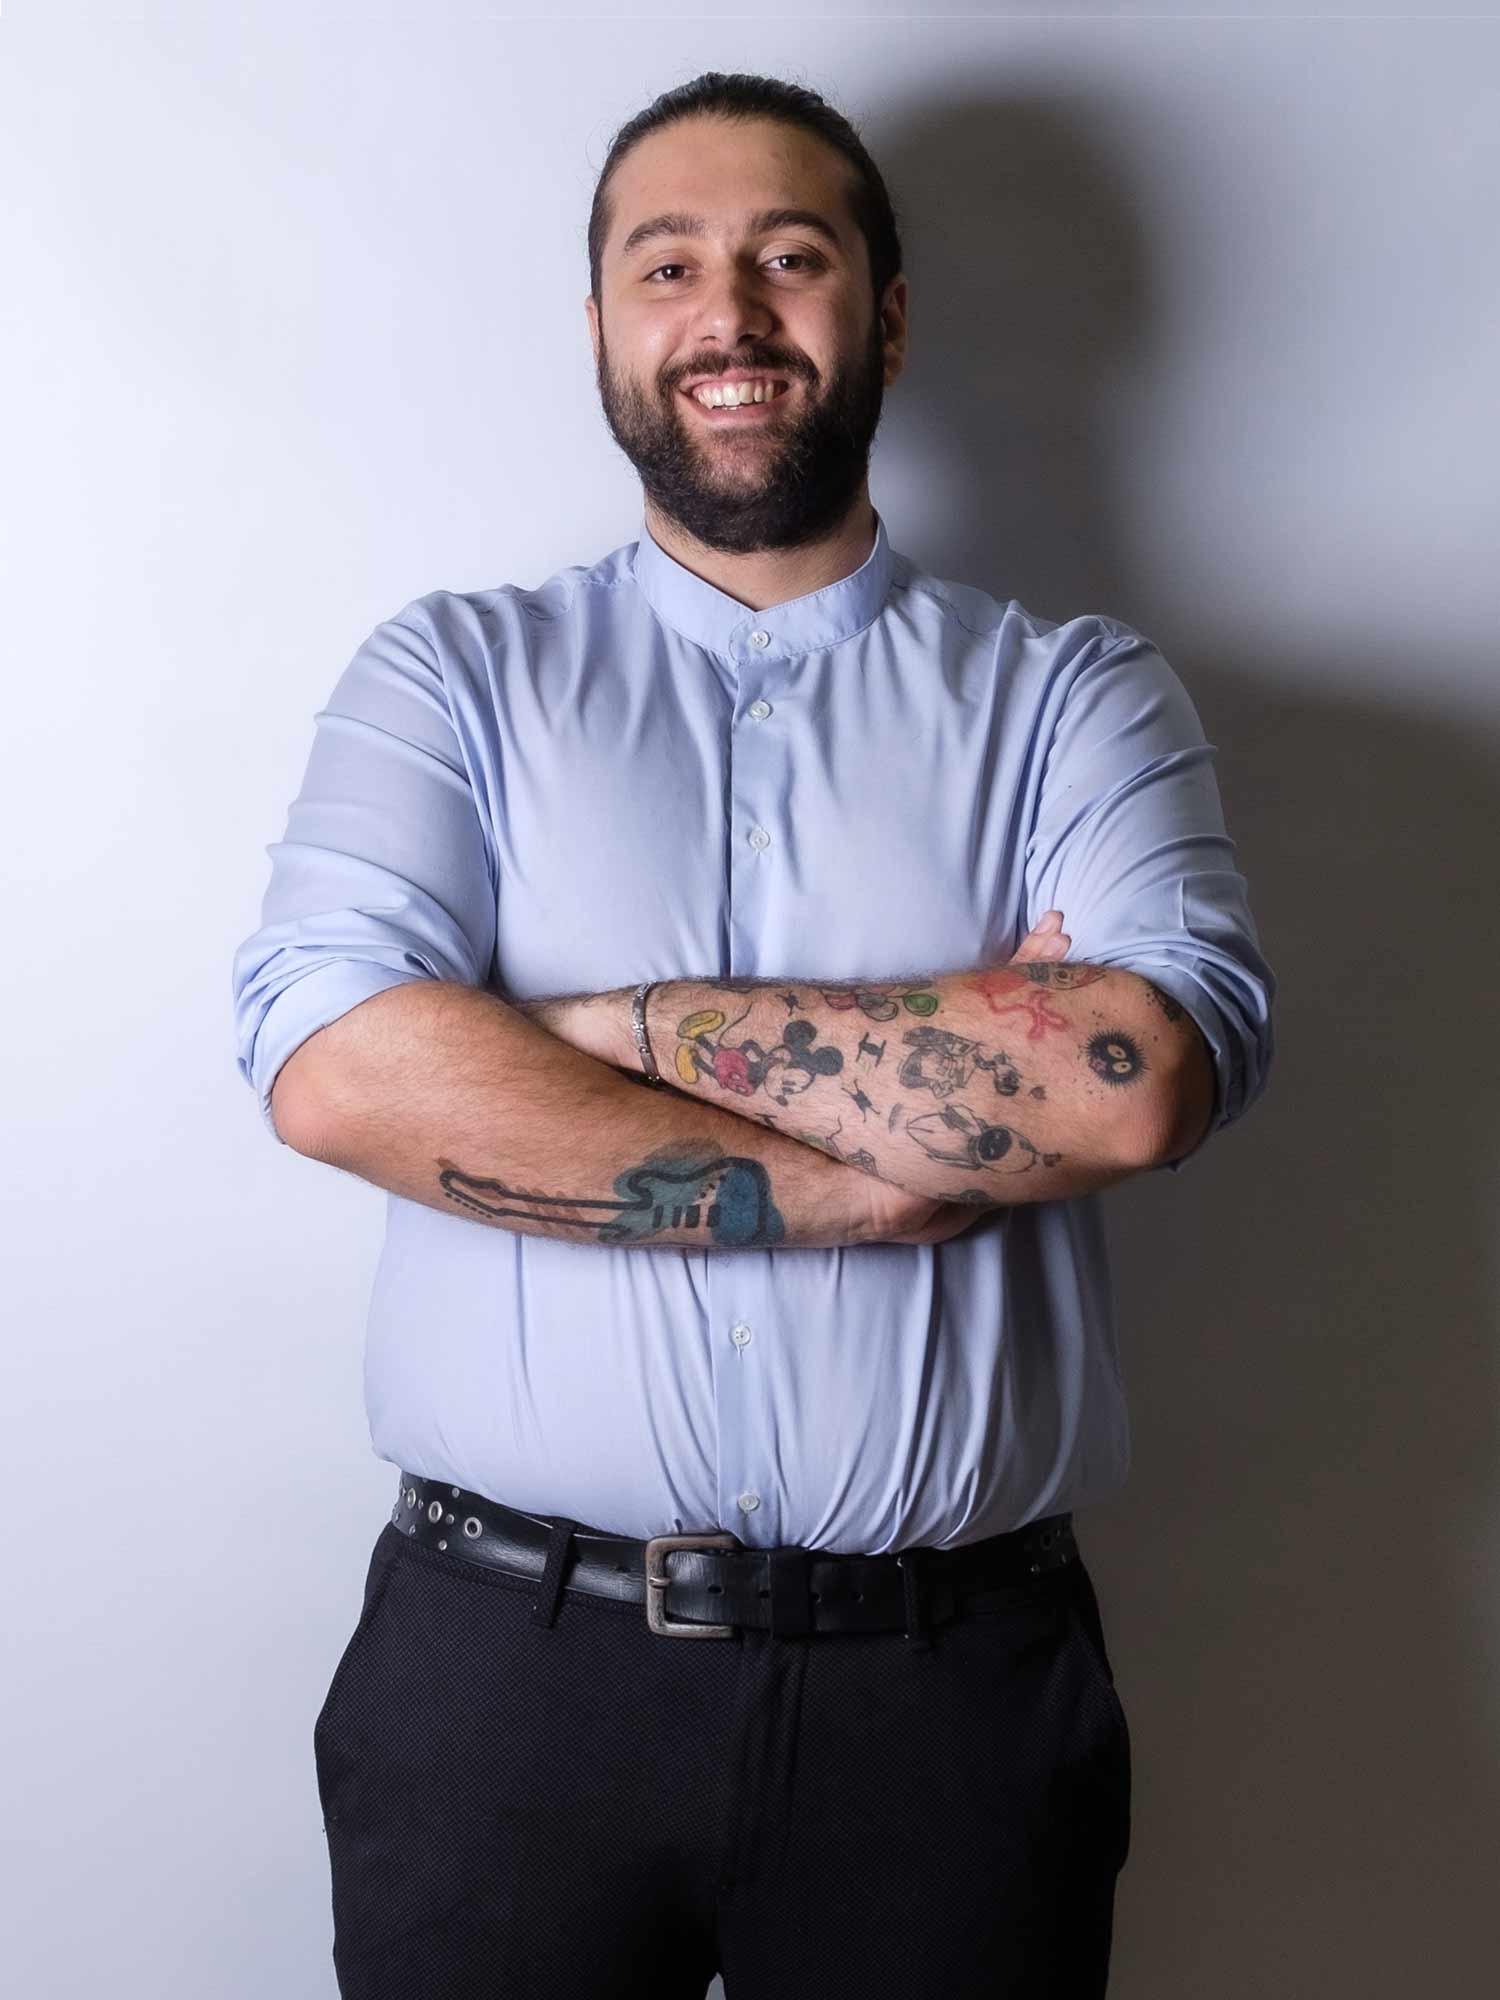 Marco Furelli